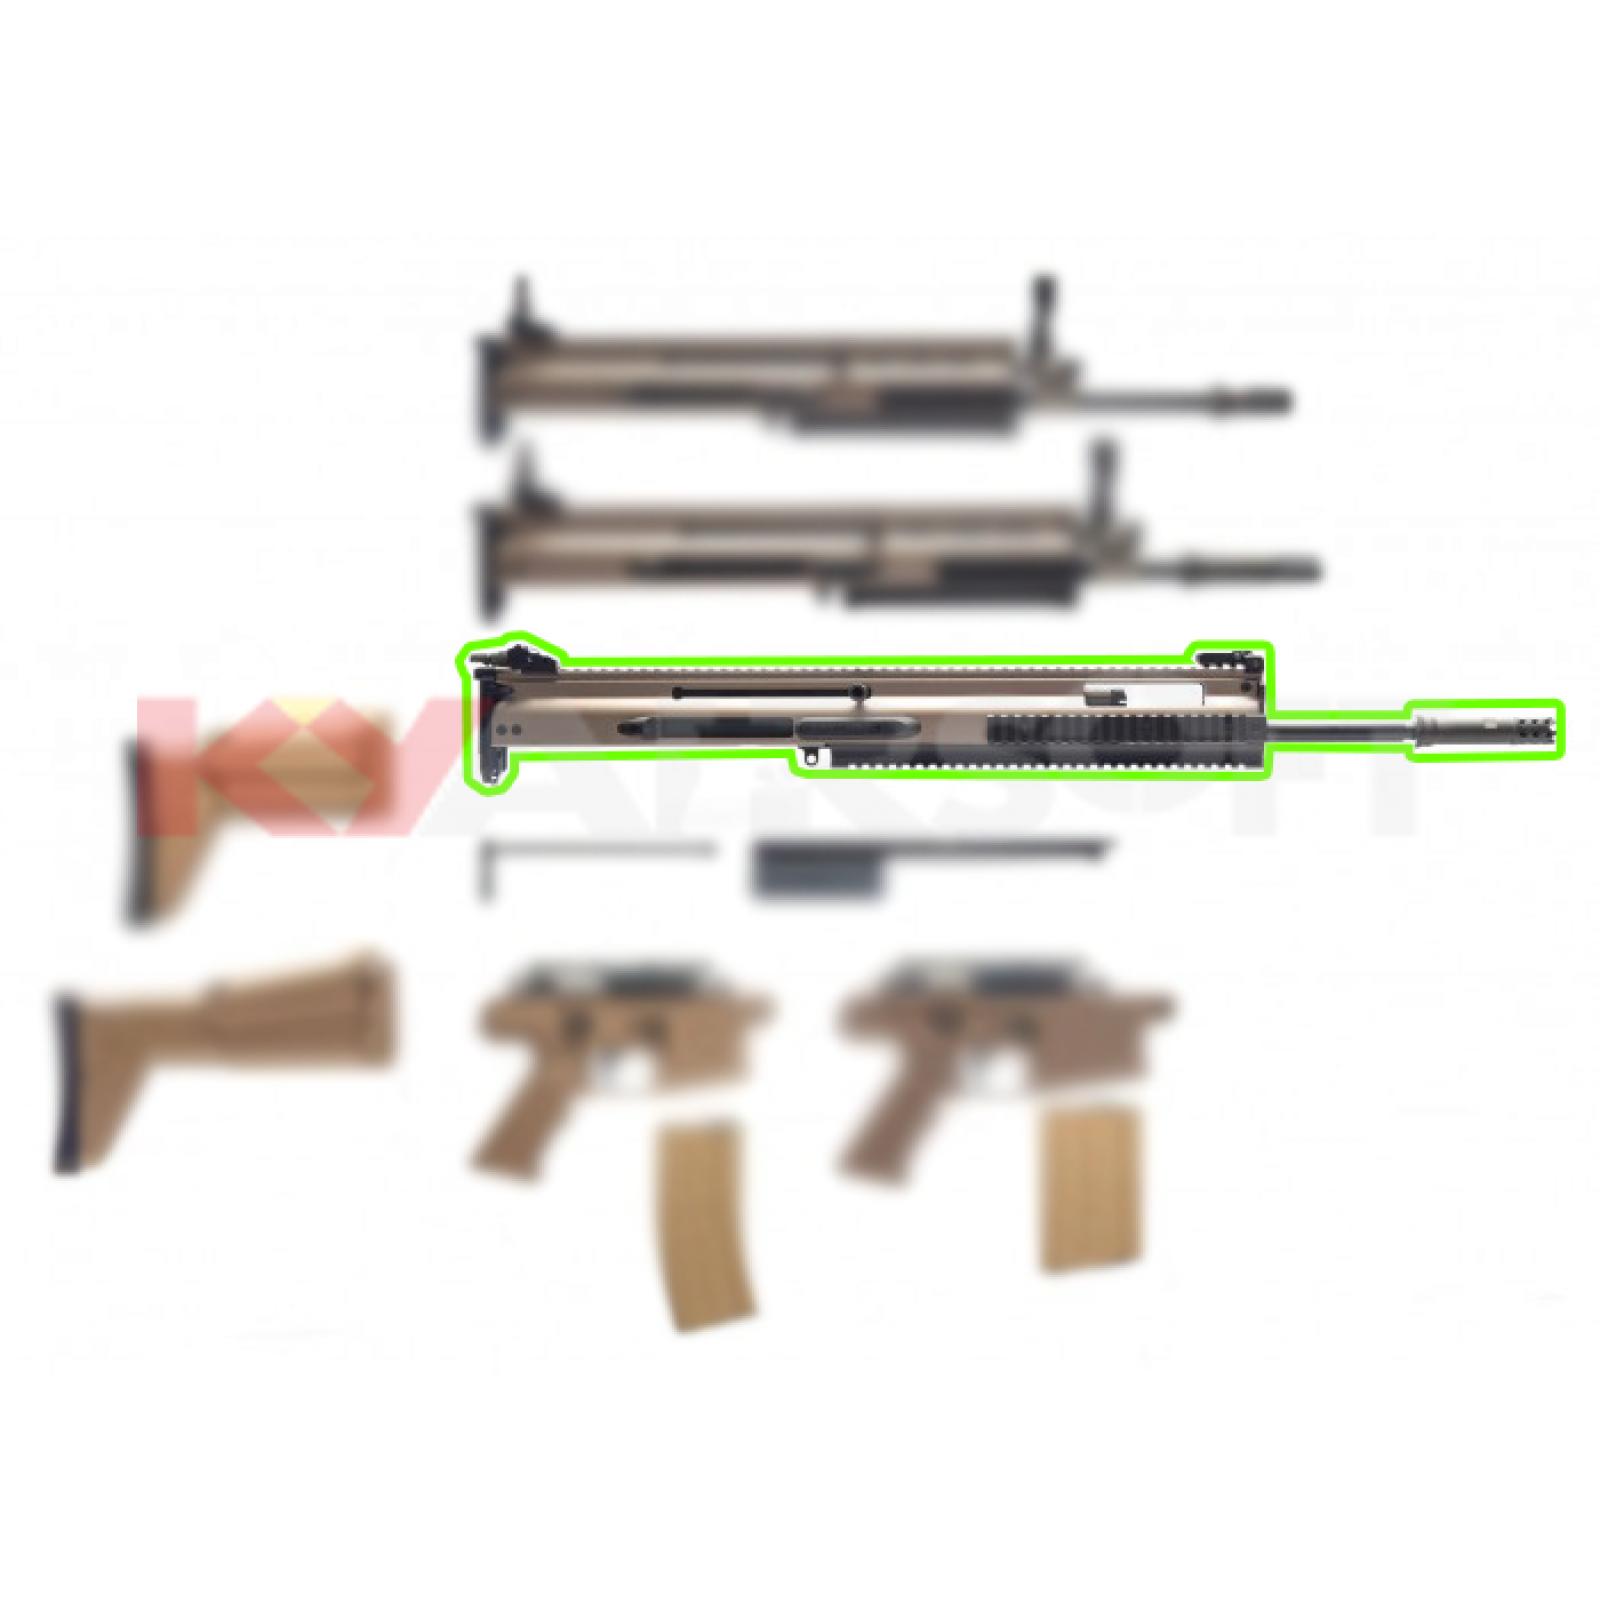 WE-Tech [SCAR SSR AEG] upper conversion kit (For SCAR -H